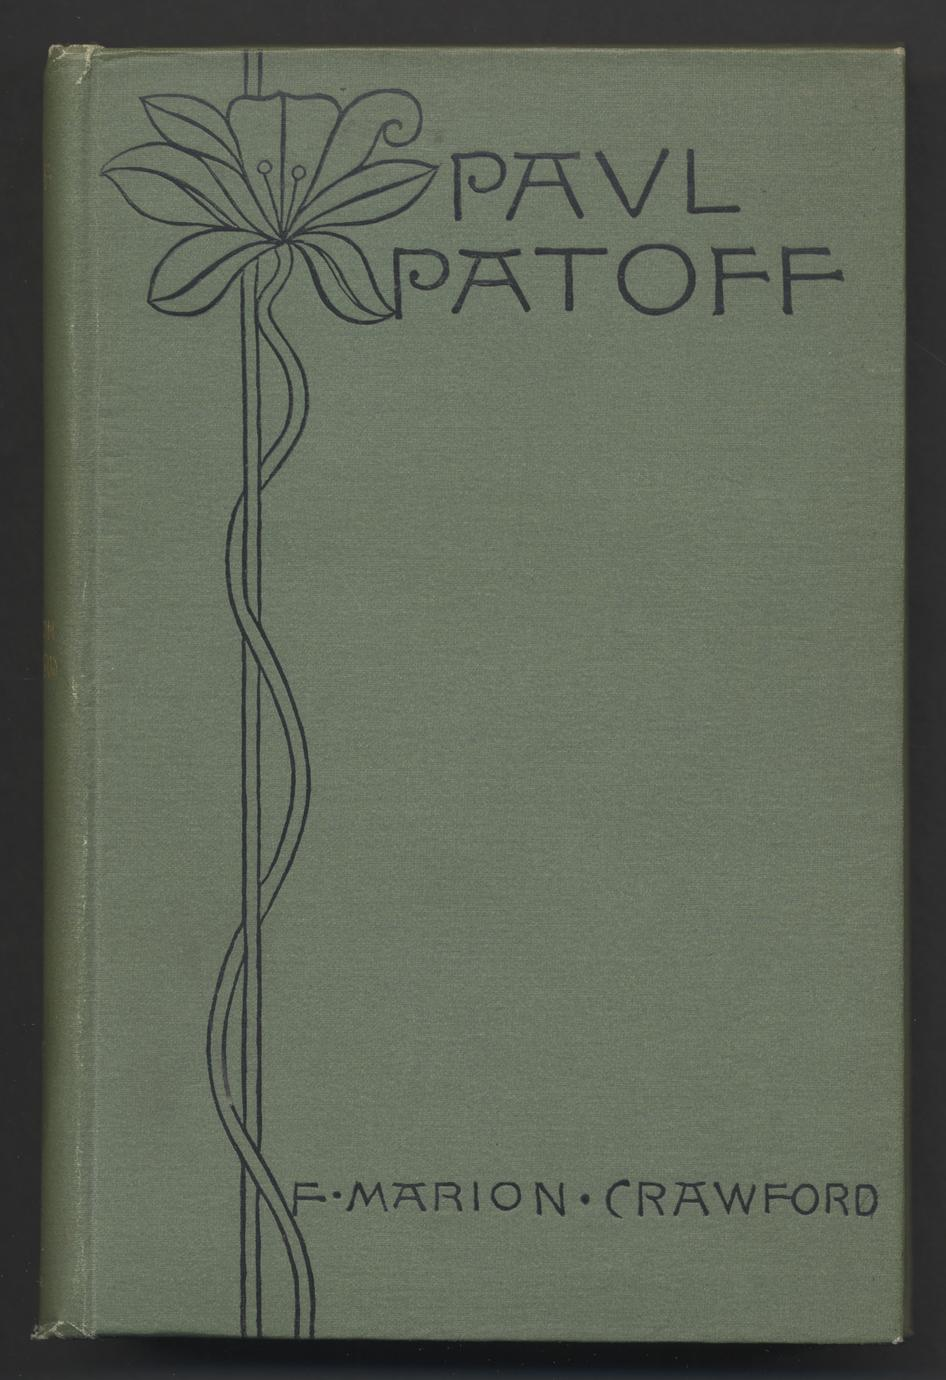 Paul Patoff (1 of 2)